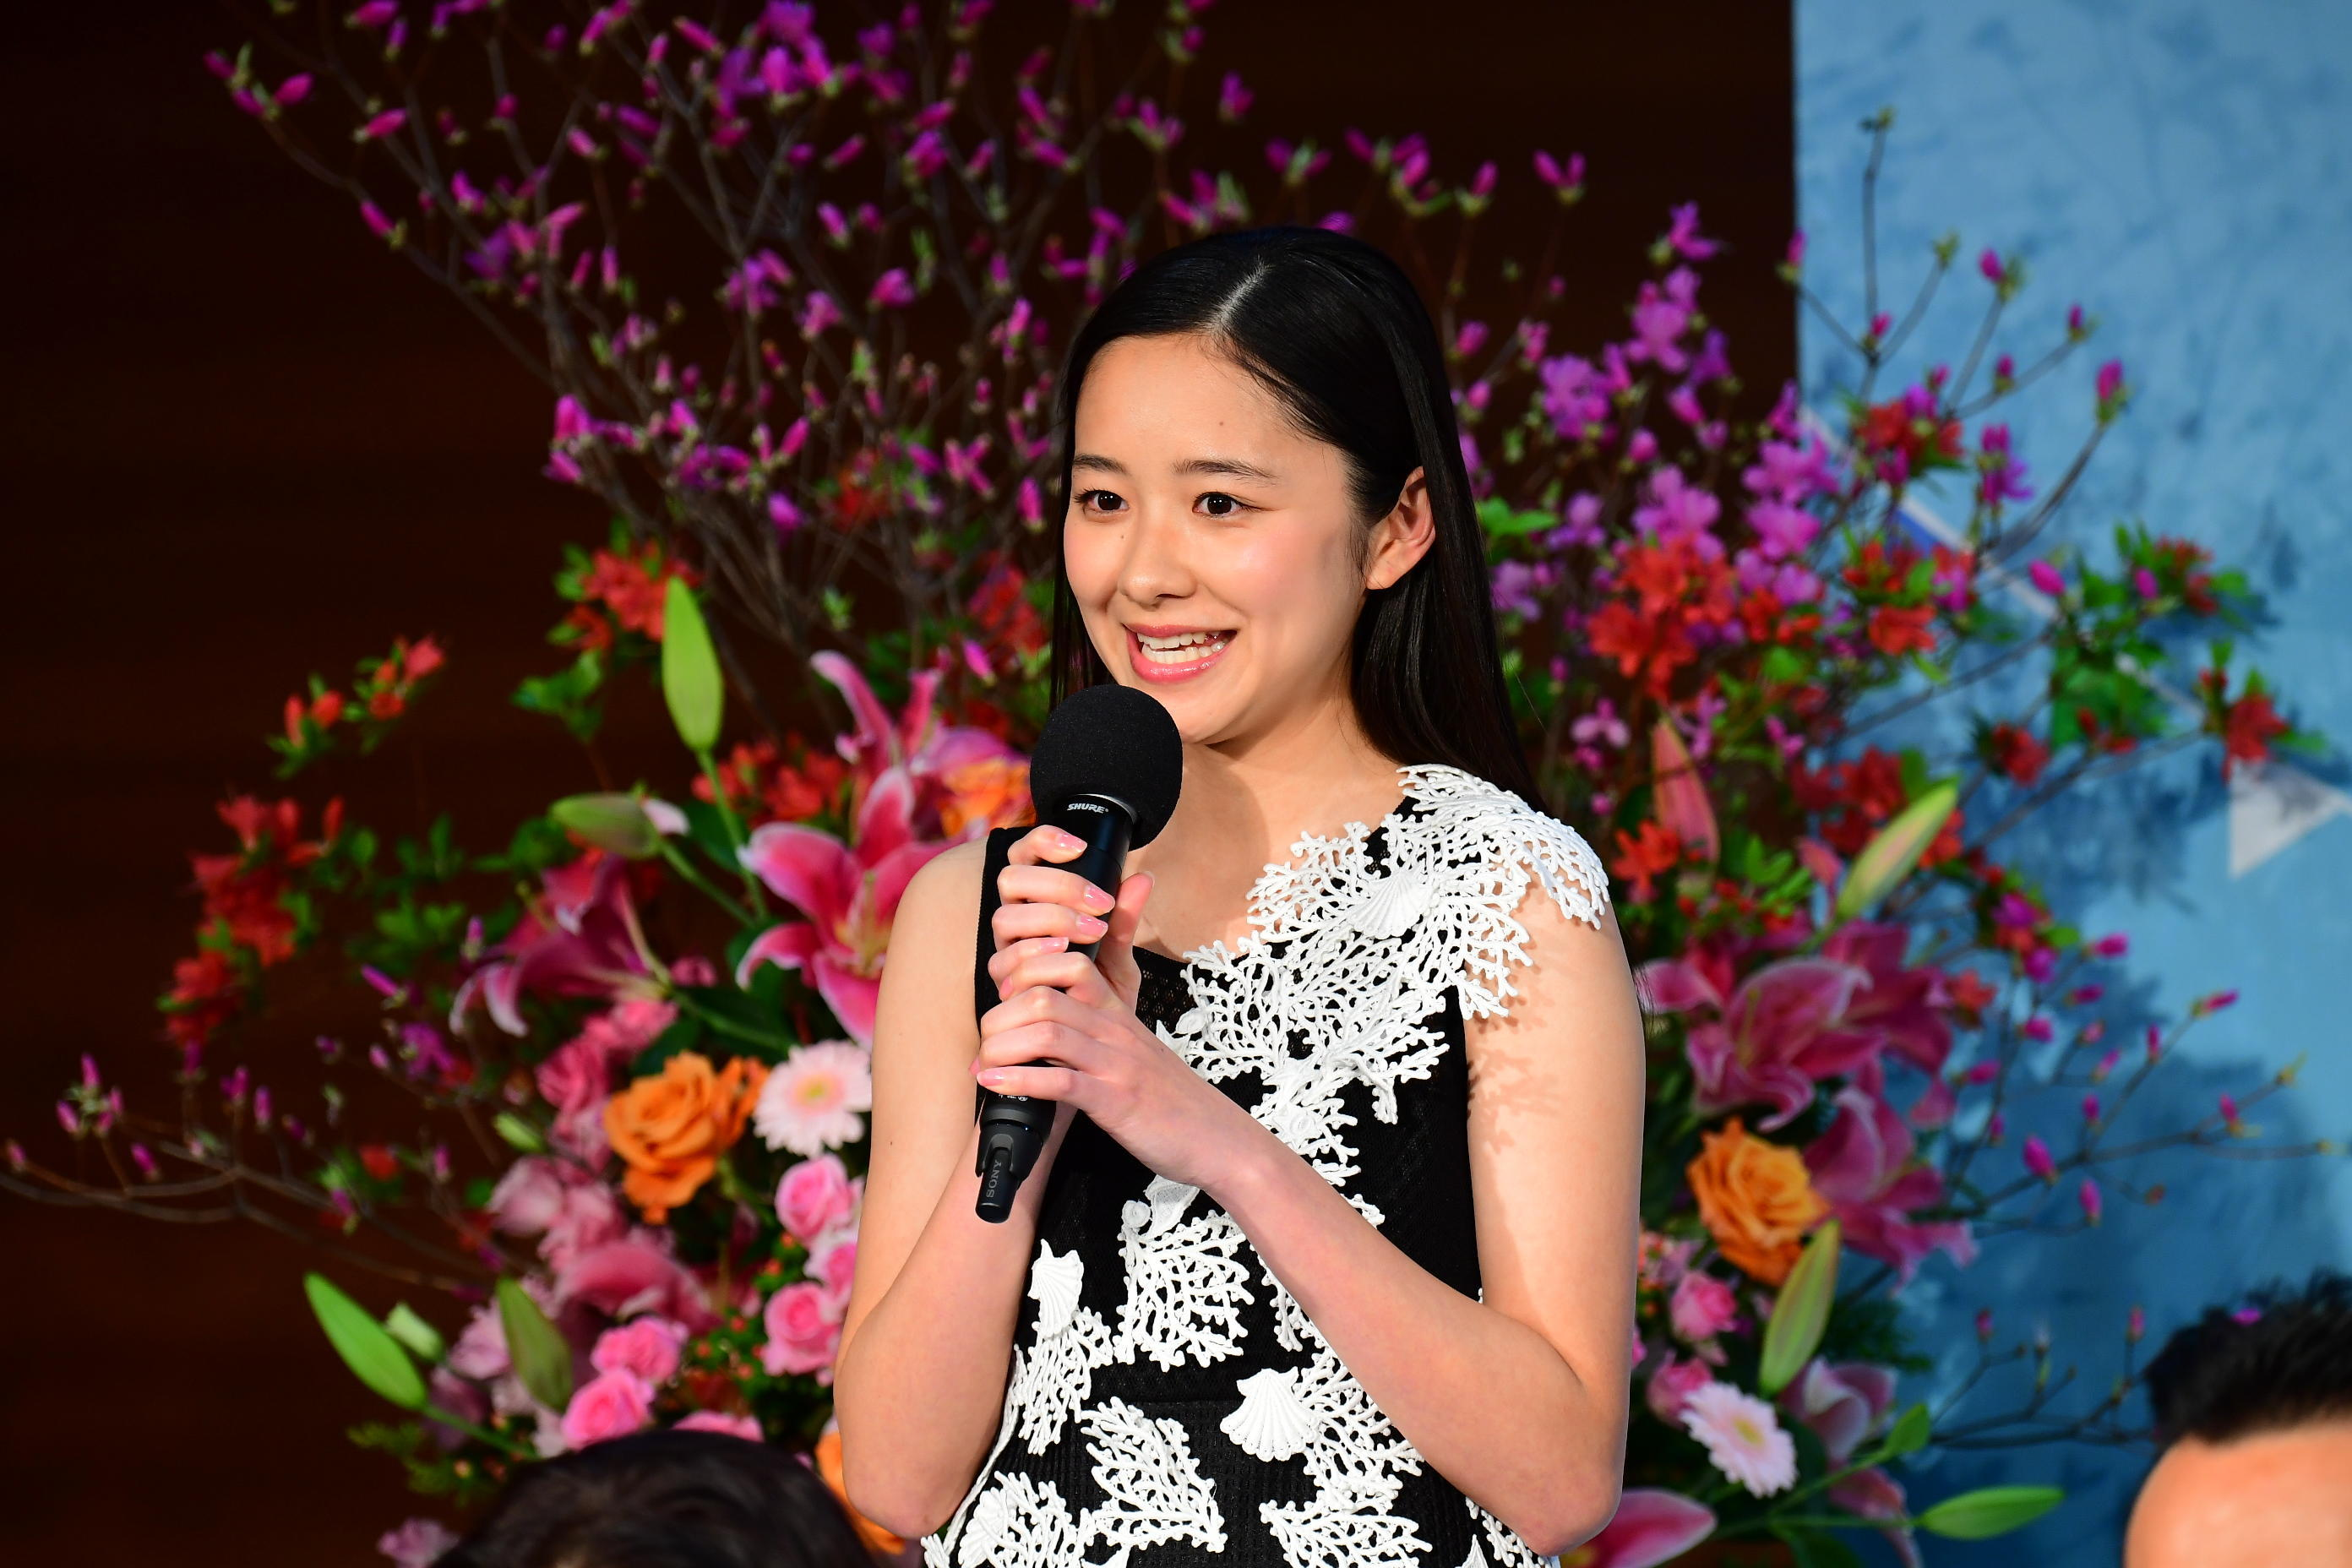 http://news.yoshimoto.co.jp/20170420183159-6292cc74532bcdb4b0a1423b56a3c5230c80d9e0.jpg